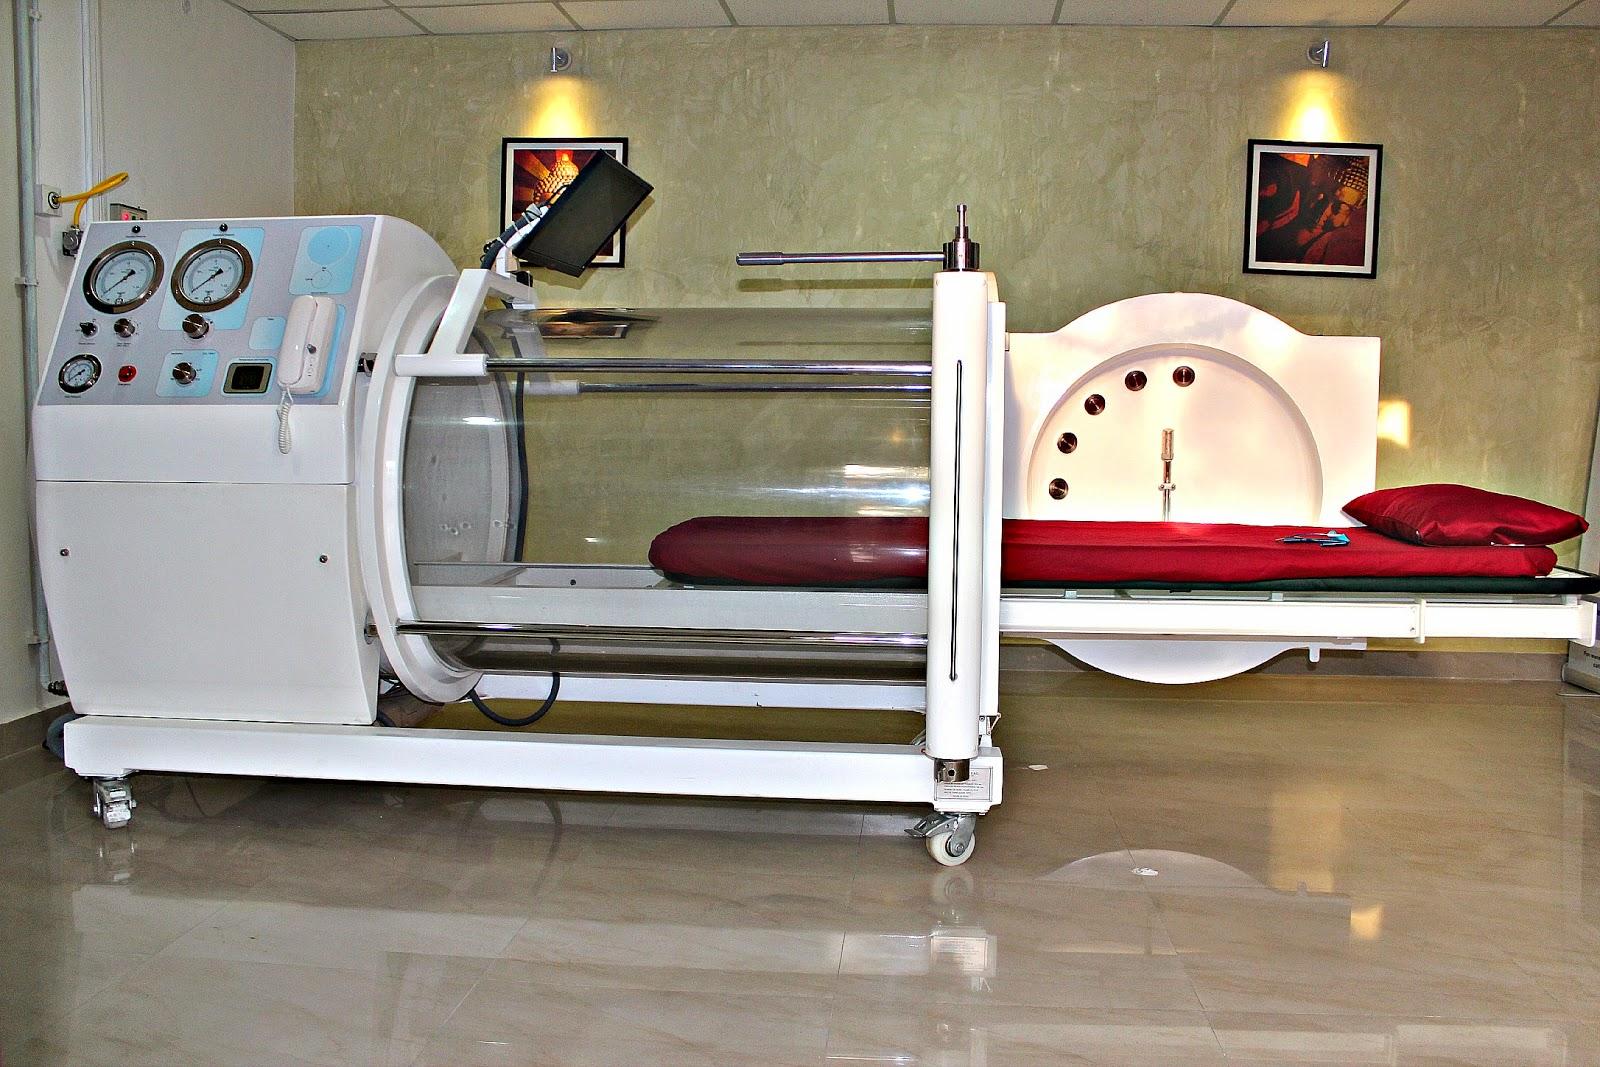 http://1.bp.blogspot.com/-re0KohkZs_s/Uz0XO2JLaYI/AAAAAAAAEsk/Y4mLMdfkv3Y/s1600/India+Hyperbaric+chamber.jpg